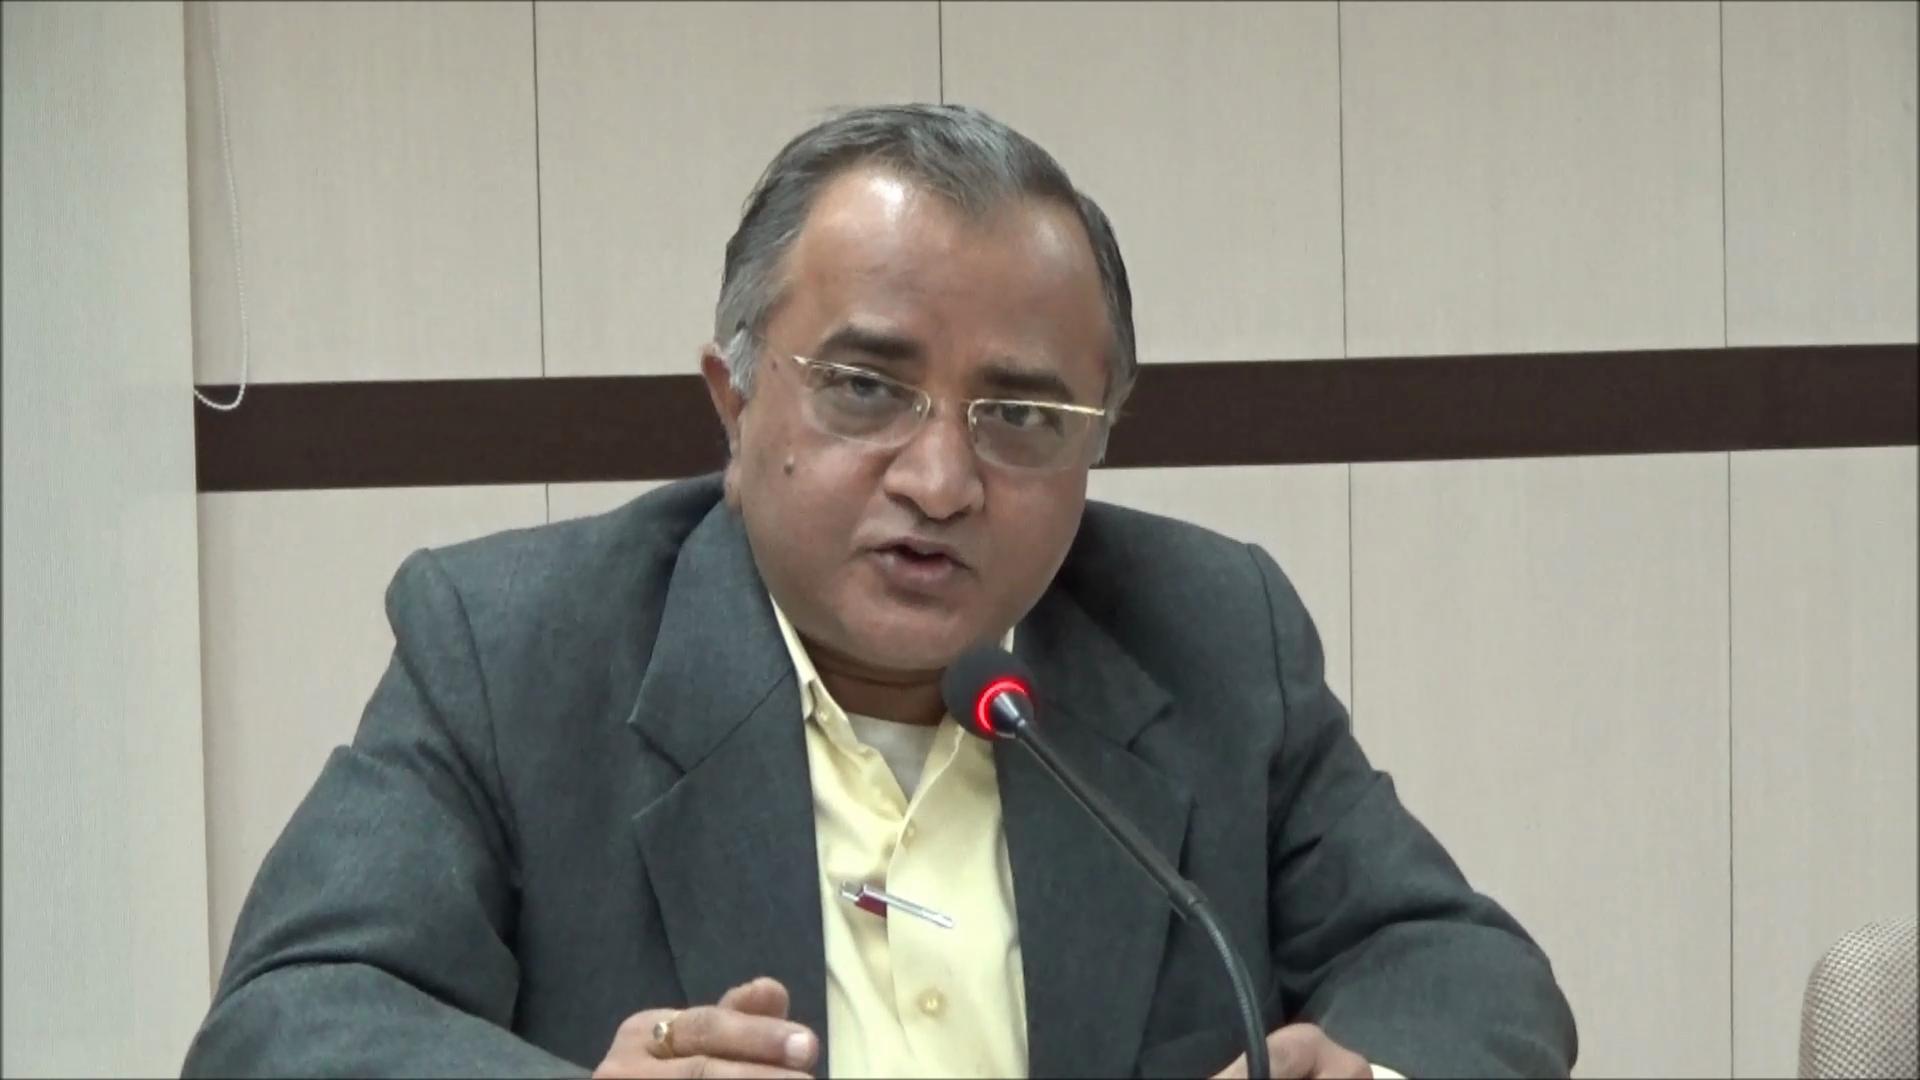 Dr Vijay Agrawal on Dukhon se Chhutkara